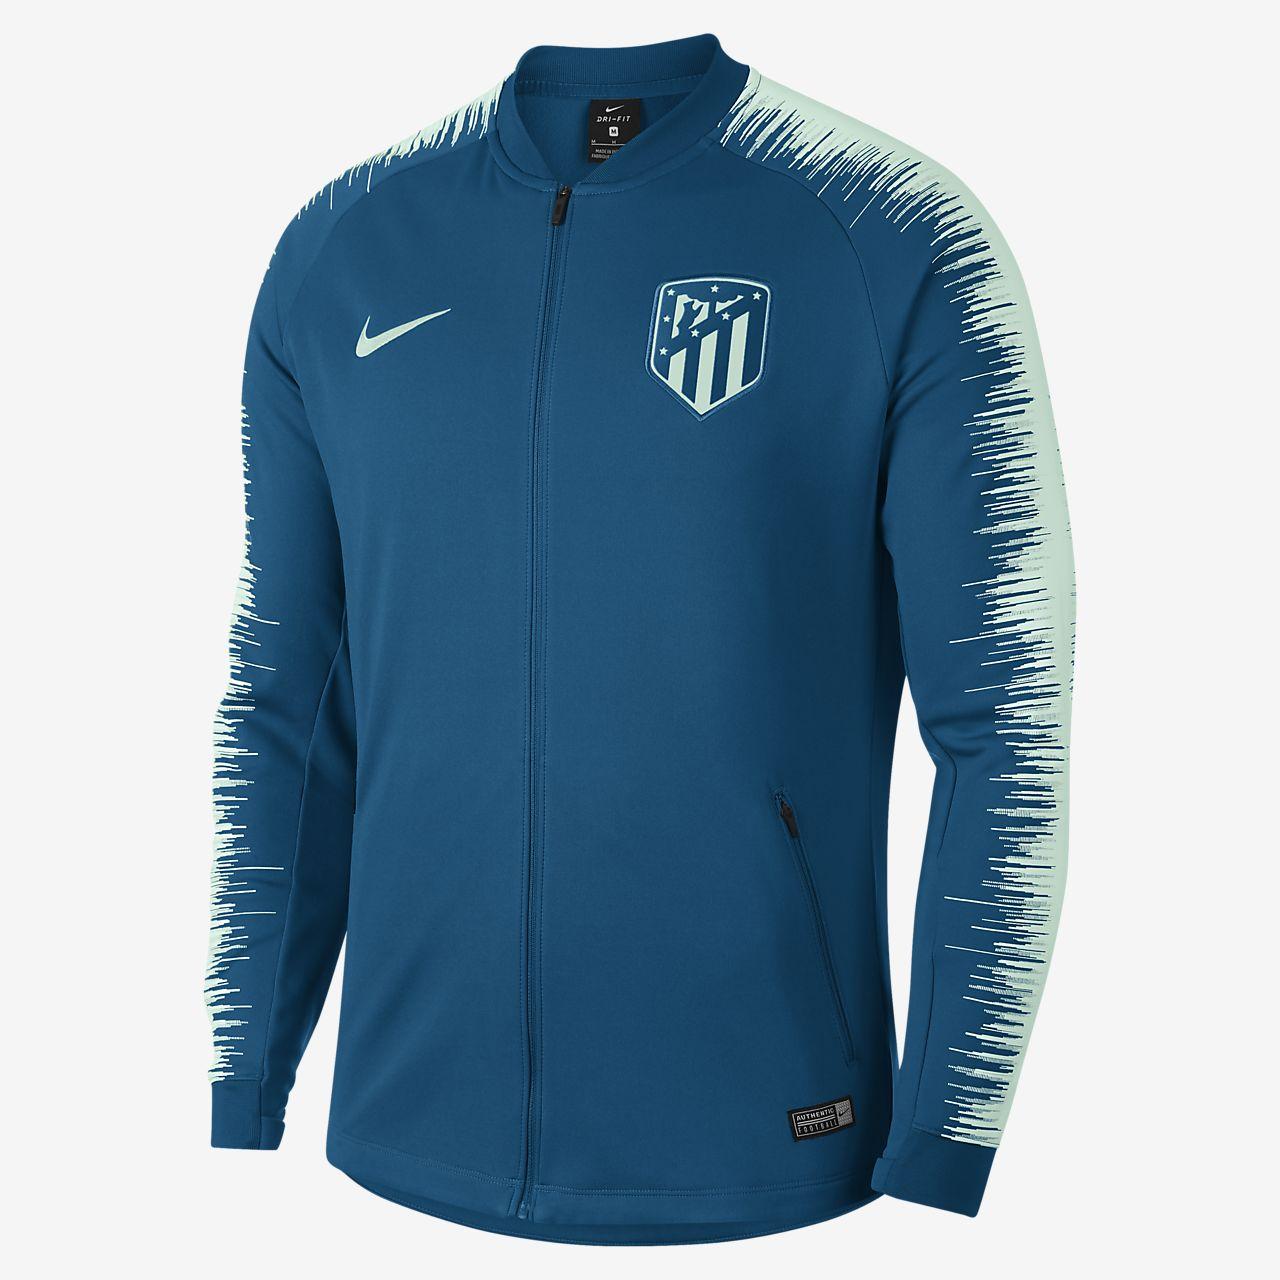 c60d385c5e Atletico de Madrid Anthem Men's Football Jacket. Nike.com FI